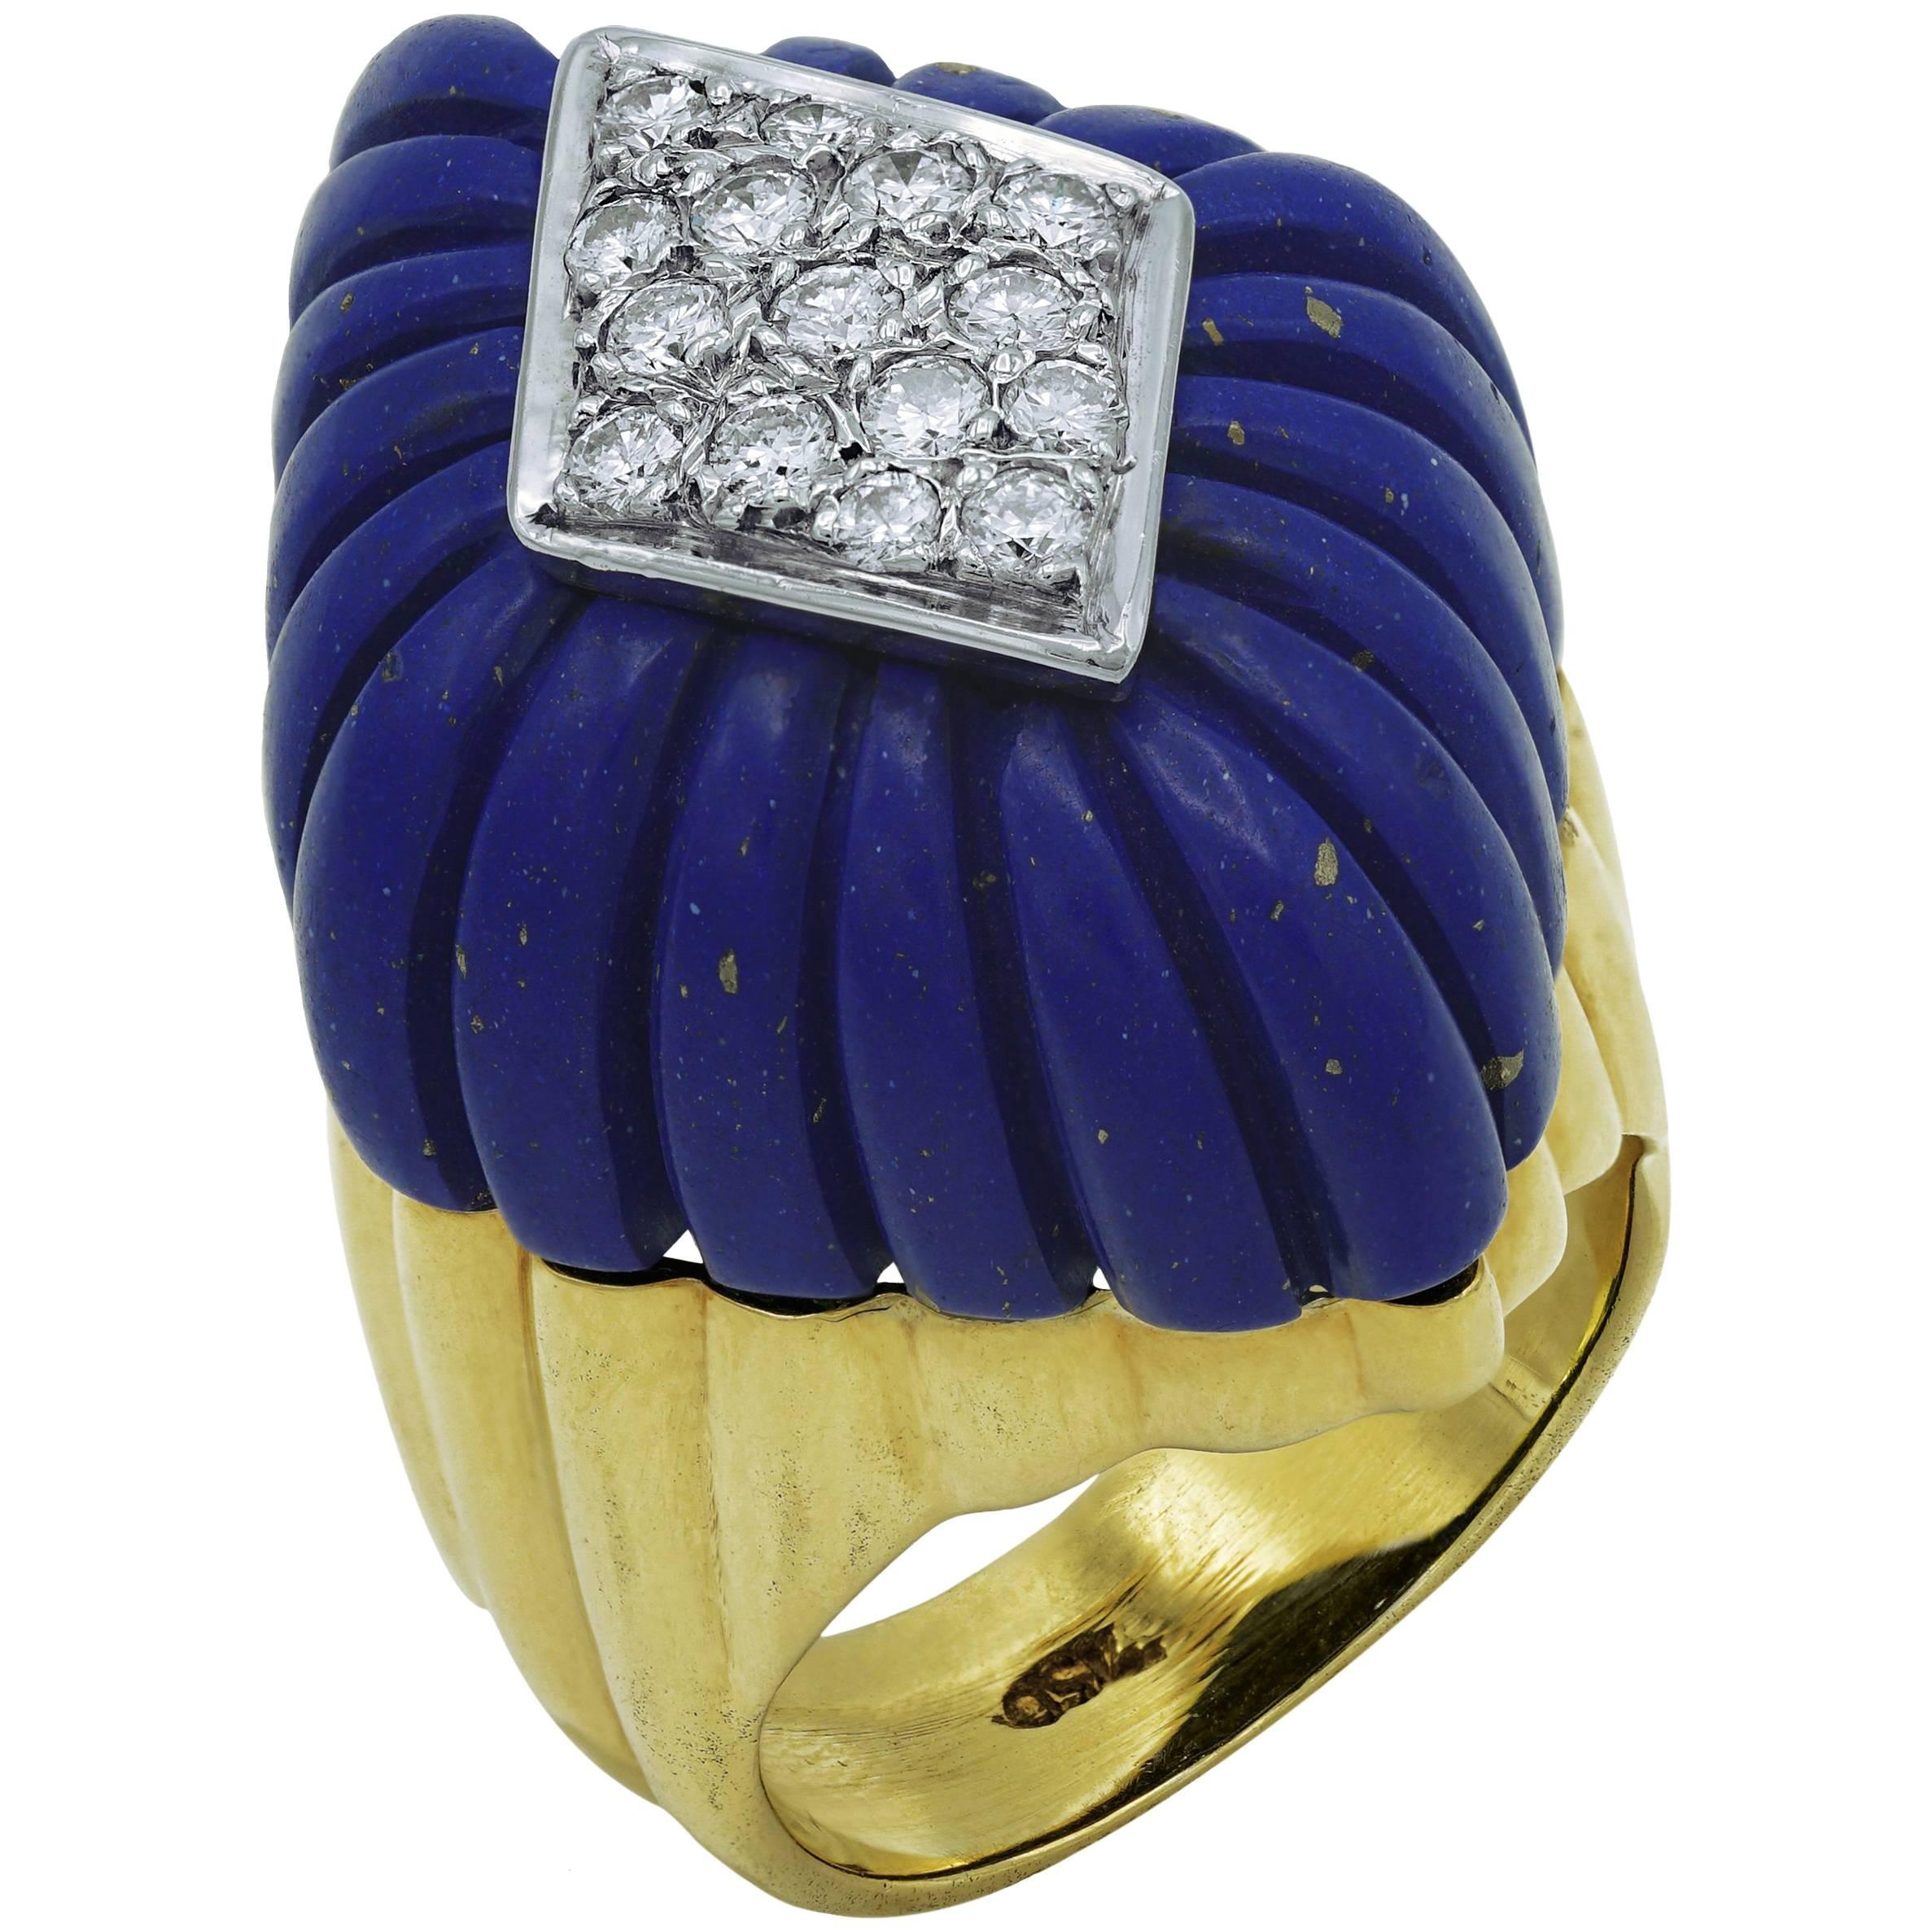 Lapis-Lazuli and Diamonds Ring